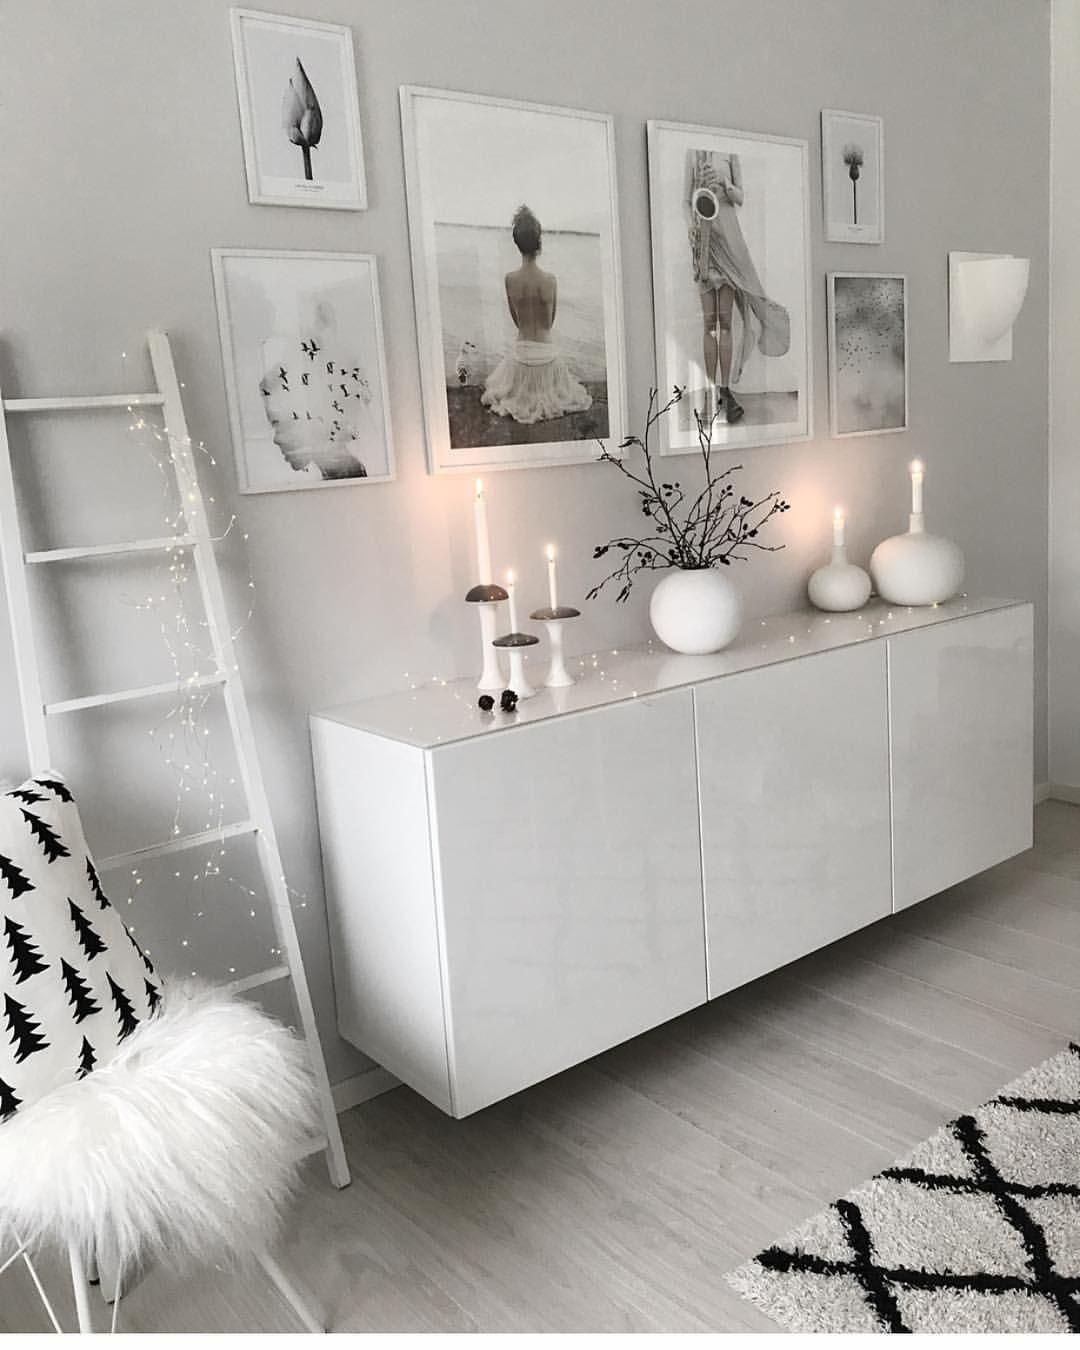 #decor #decoration #decoração #bedroom #inspiration # housesinspiration #livingroom #kitchen #styling #home #stueindretning